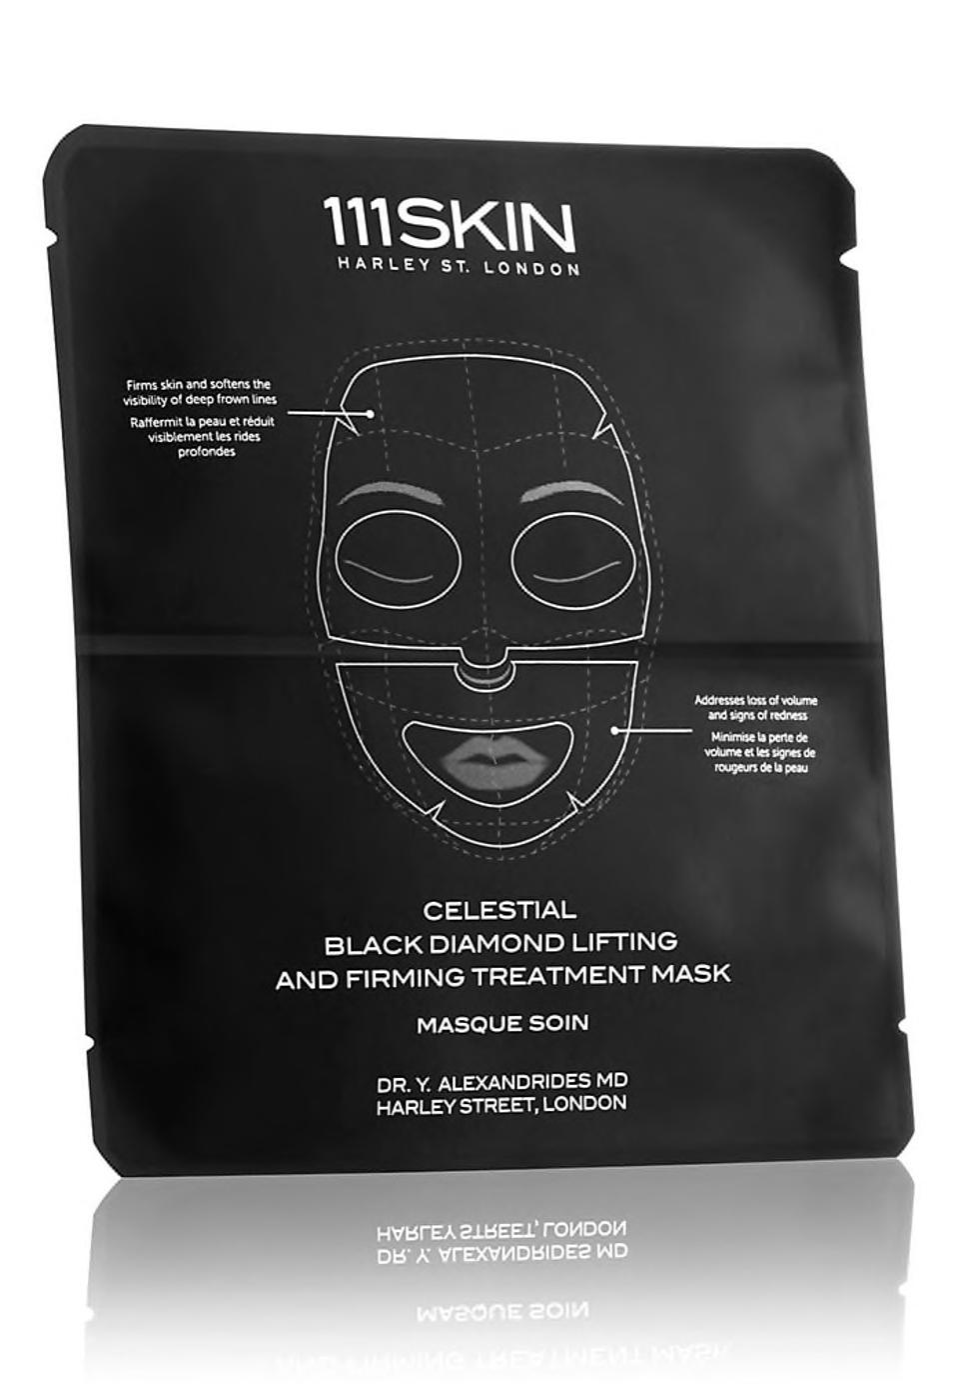 111Skin Celestial Black Diamond Lifting & Firming Mask